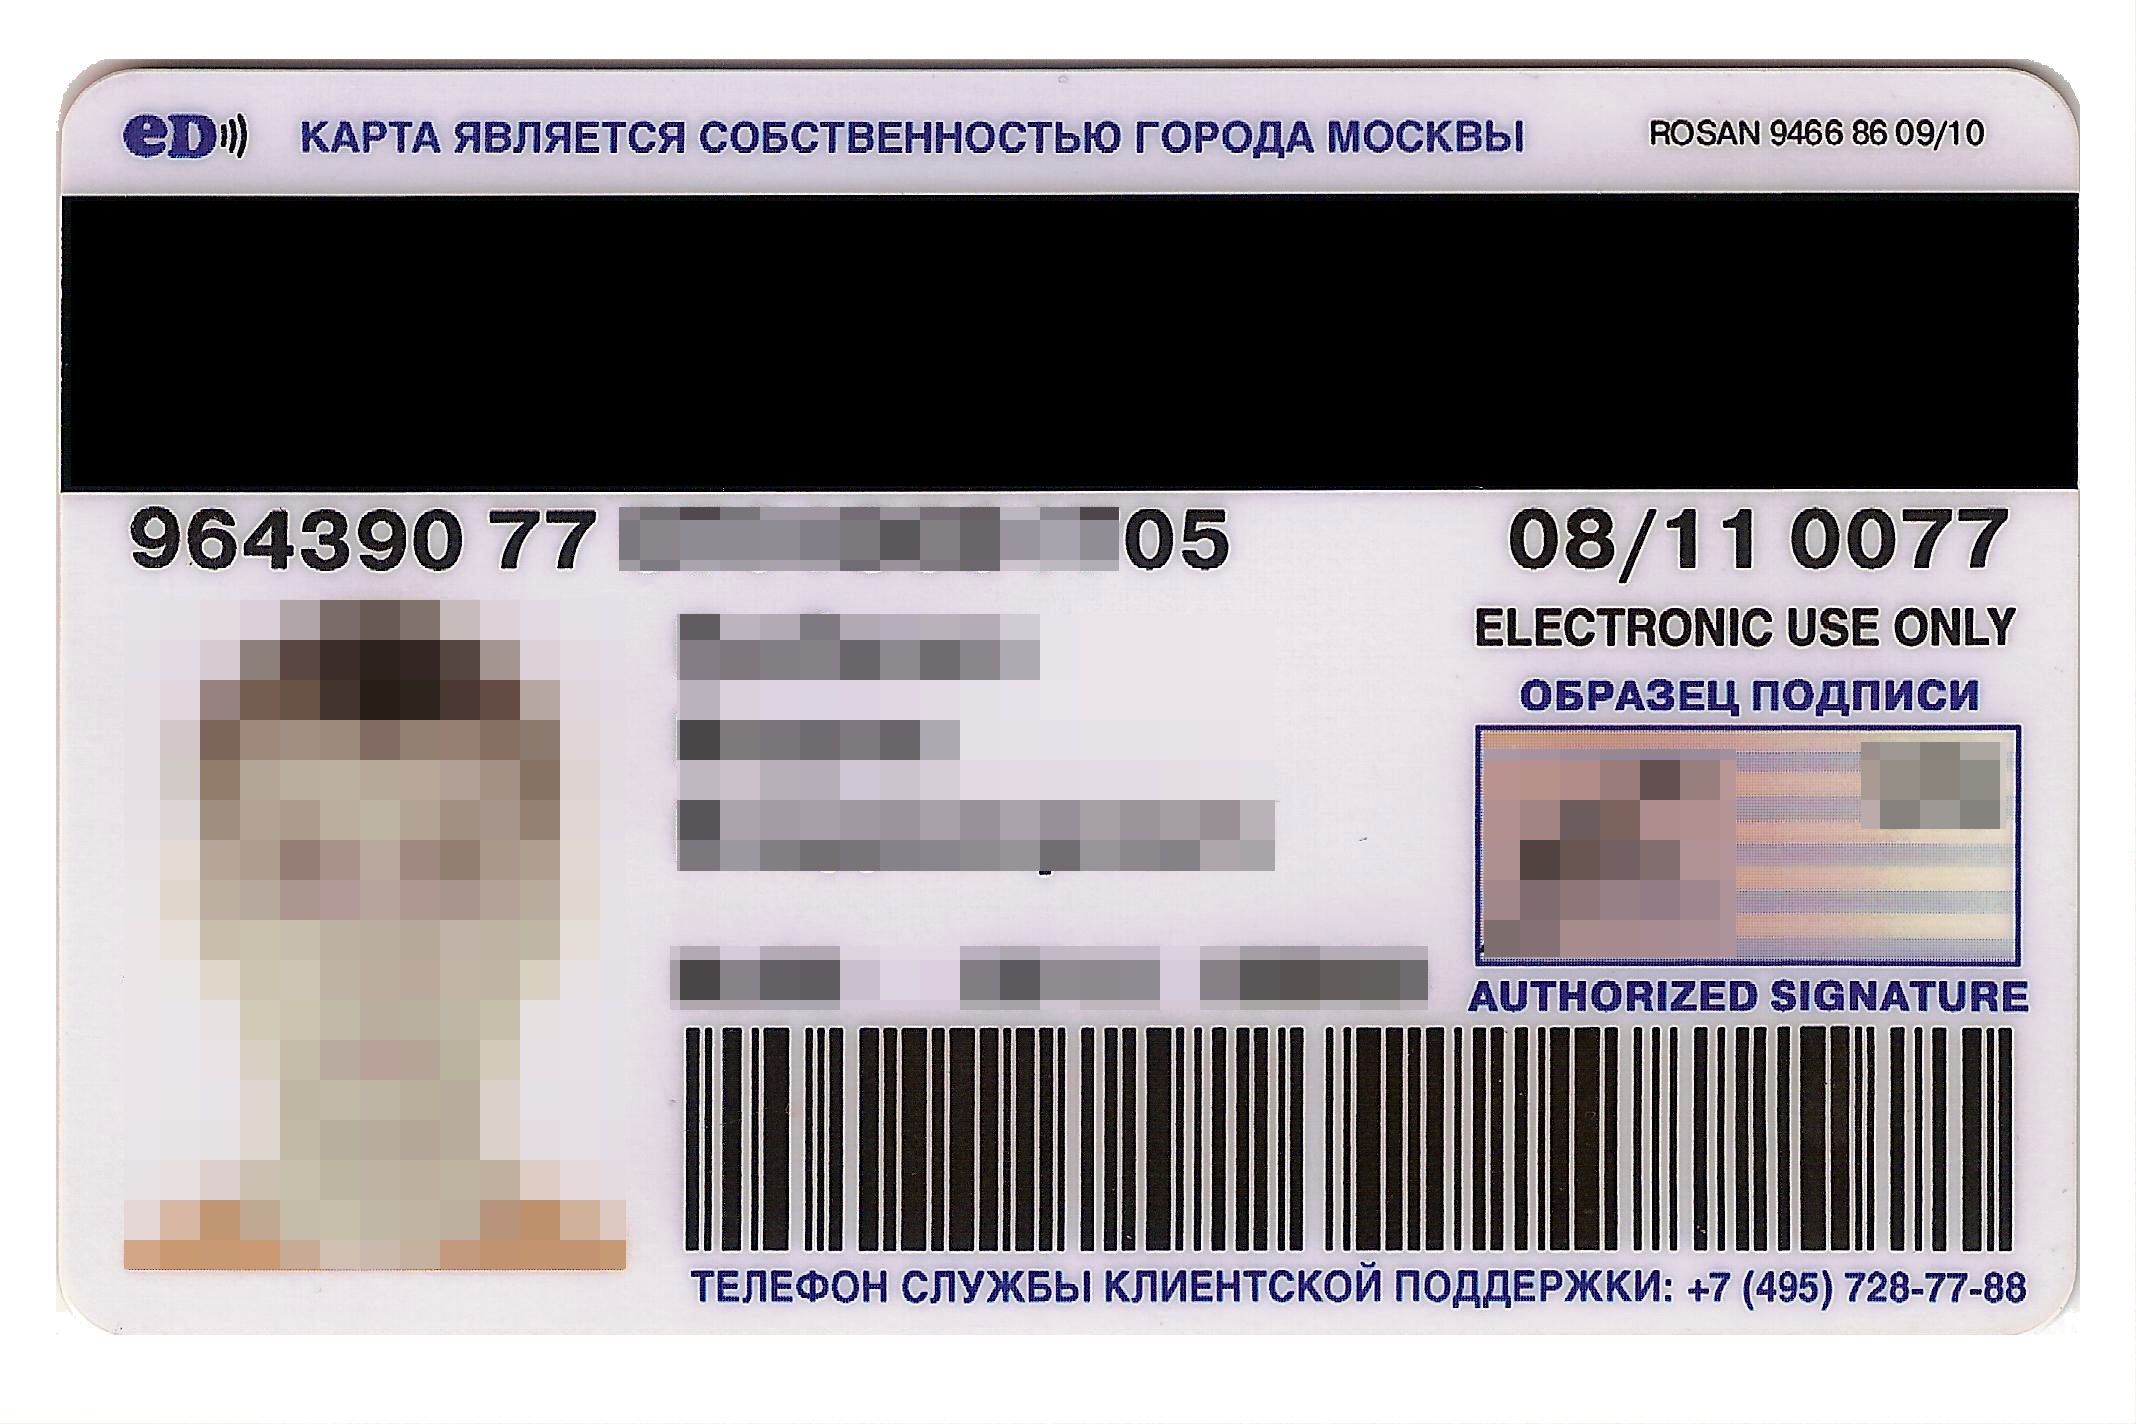 социальная карта москвича фото